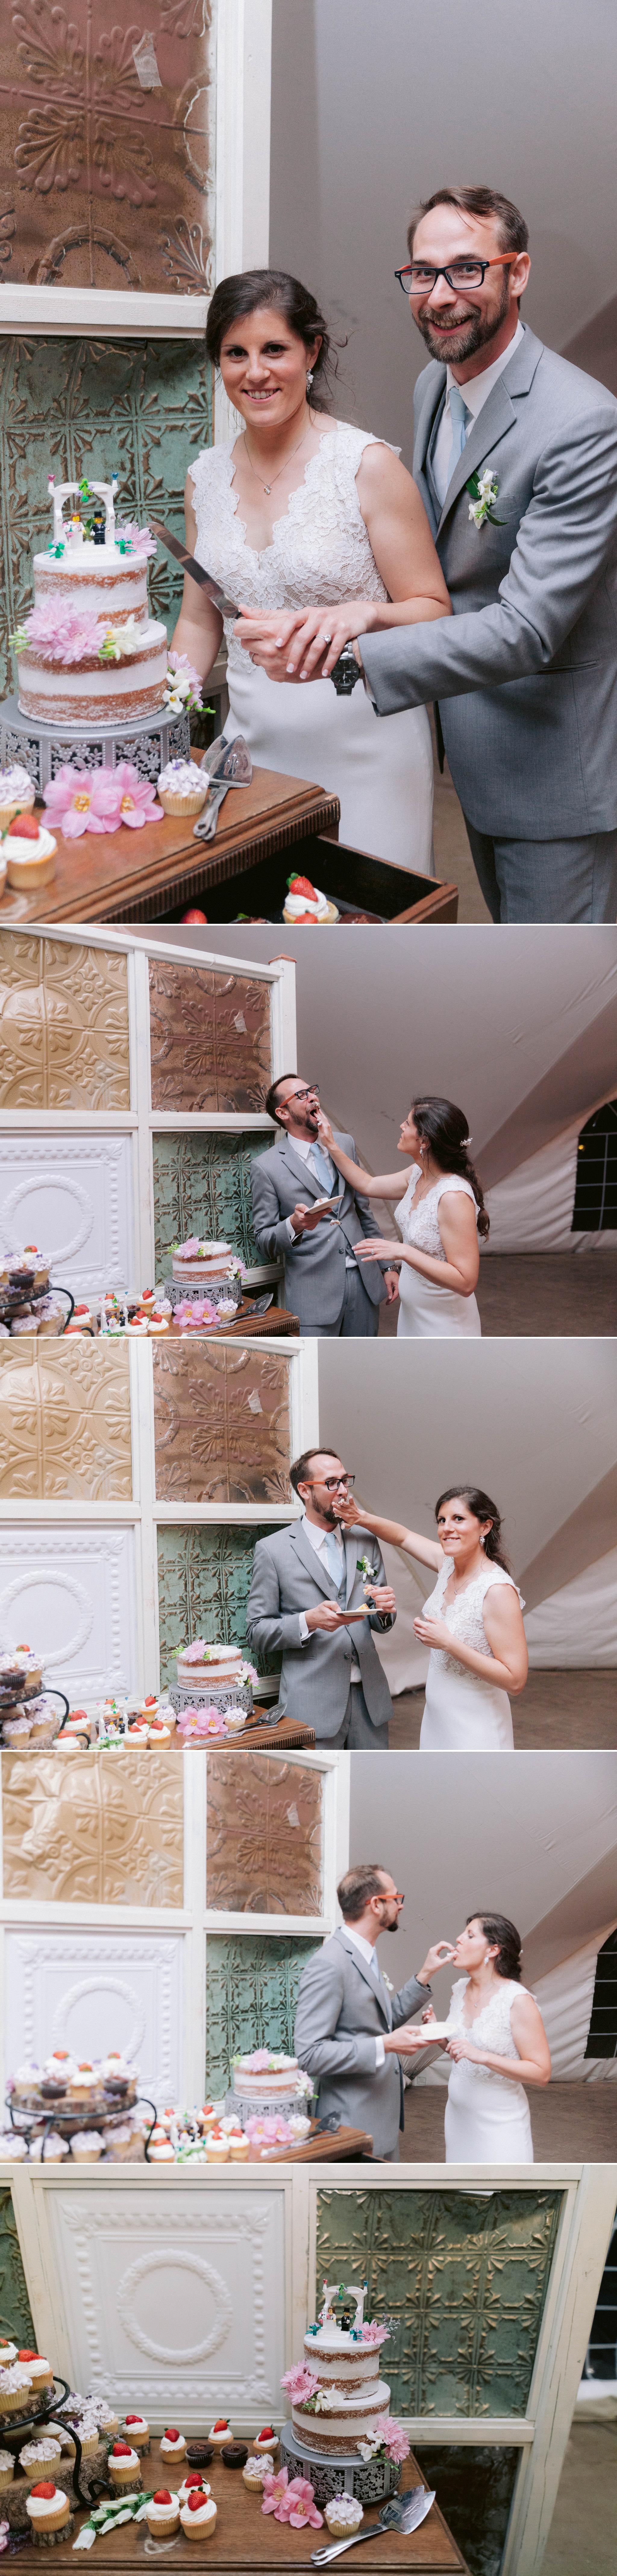 cake cutting - Honolulu Oahu Hawaii Wedding Photographer